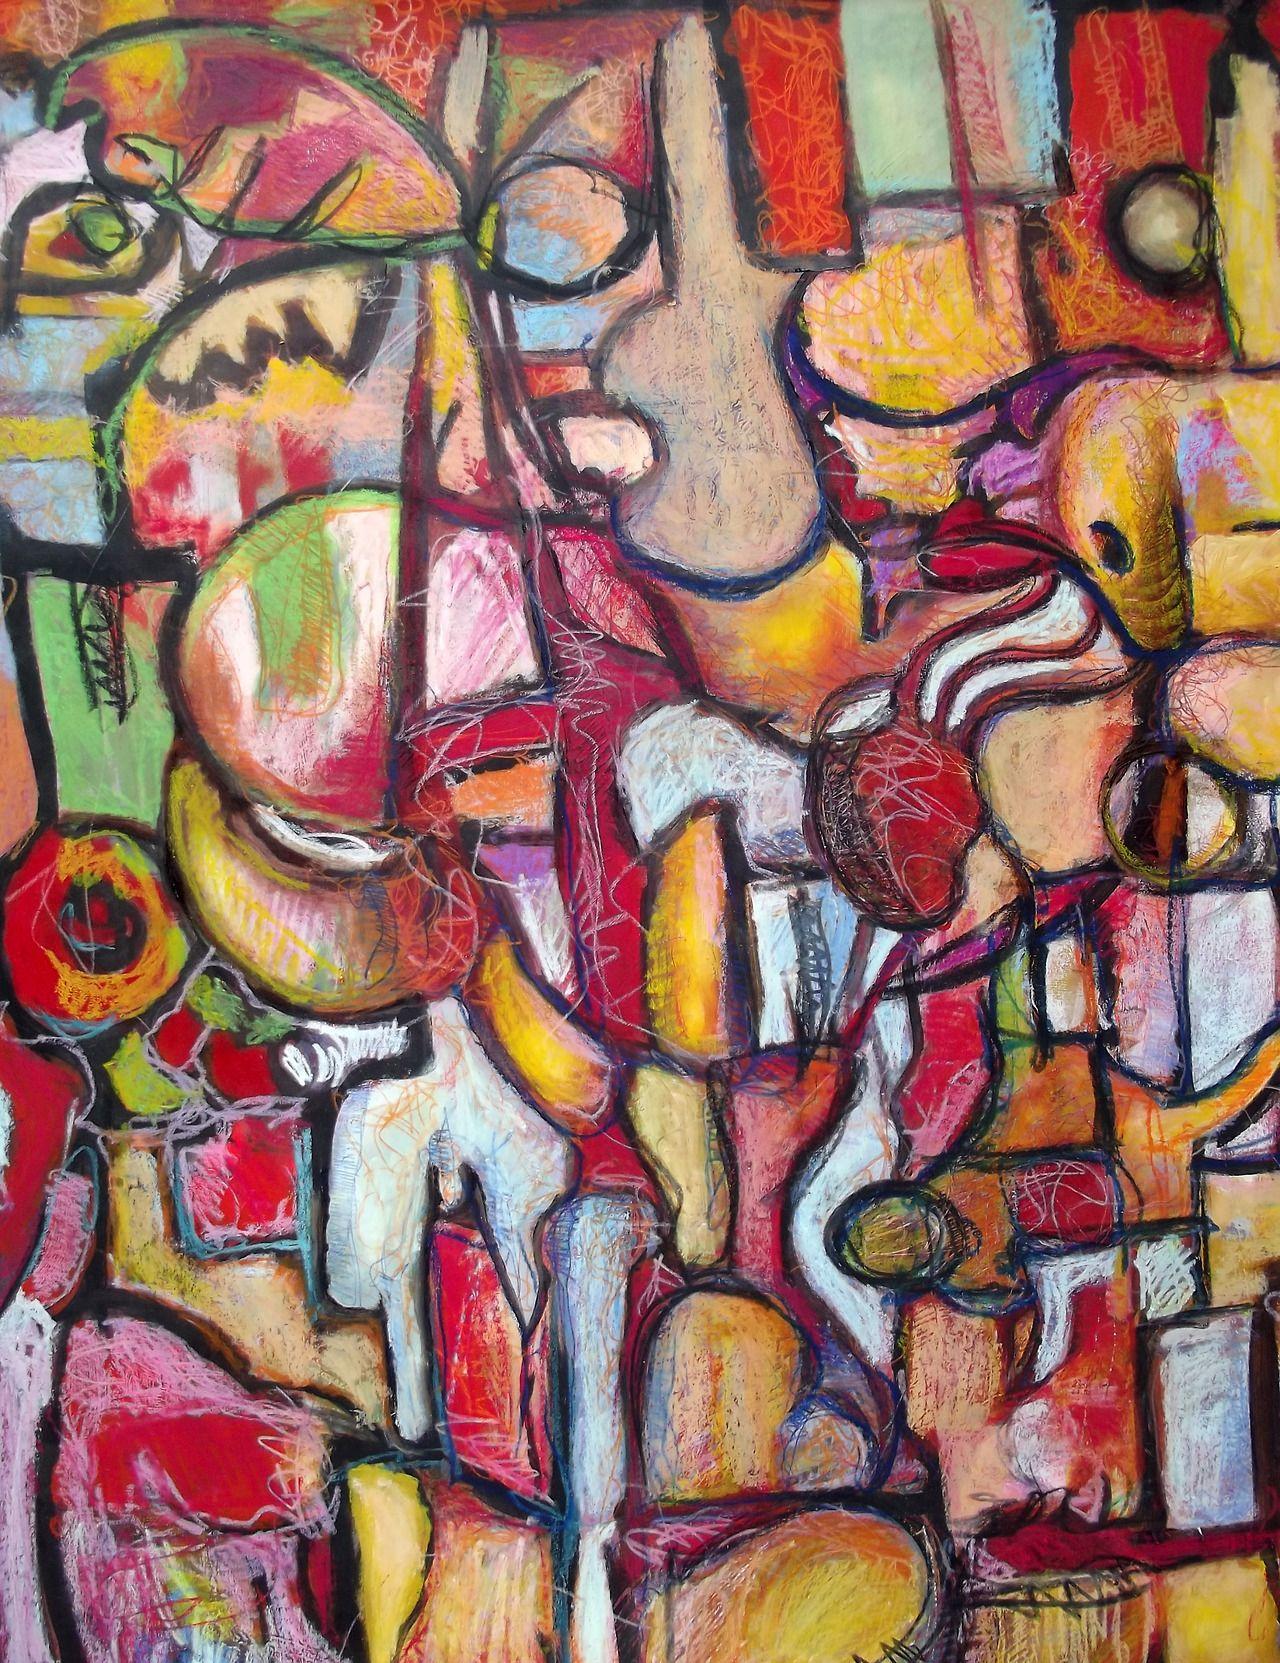 Sobre la memoria - Mixta sobre papel - Carlos Rodríguez... #Oleo #Pintura #Acuarela #Tinta #TintaChina #Lienzo #Arte #ArteContemporáneo #Pinturacontemporánea #Cultura #Mexico #culturaMexicana #PinturaMexicana #Art #Canvas #Oil #Painting #OilPainting #Desnudo #MexicanPainting #MexicanPaint #Culture #MexicanCulture #Sonora #México #Df #EstiloMexicano